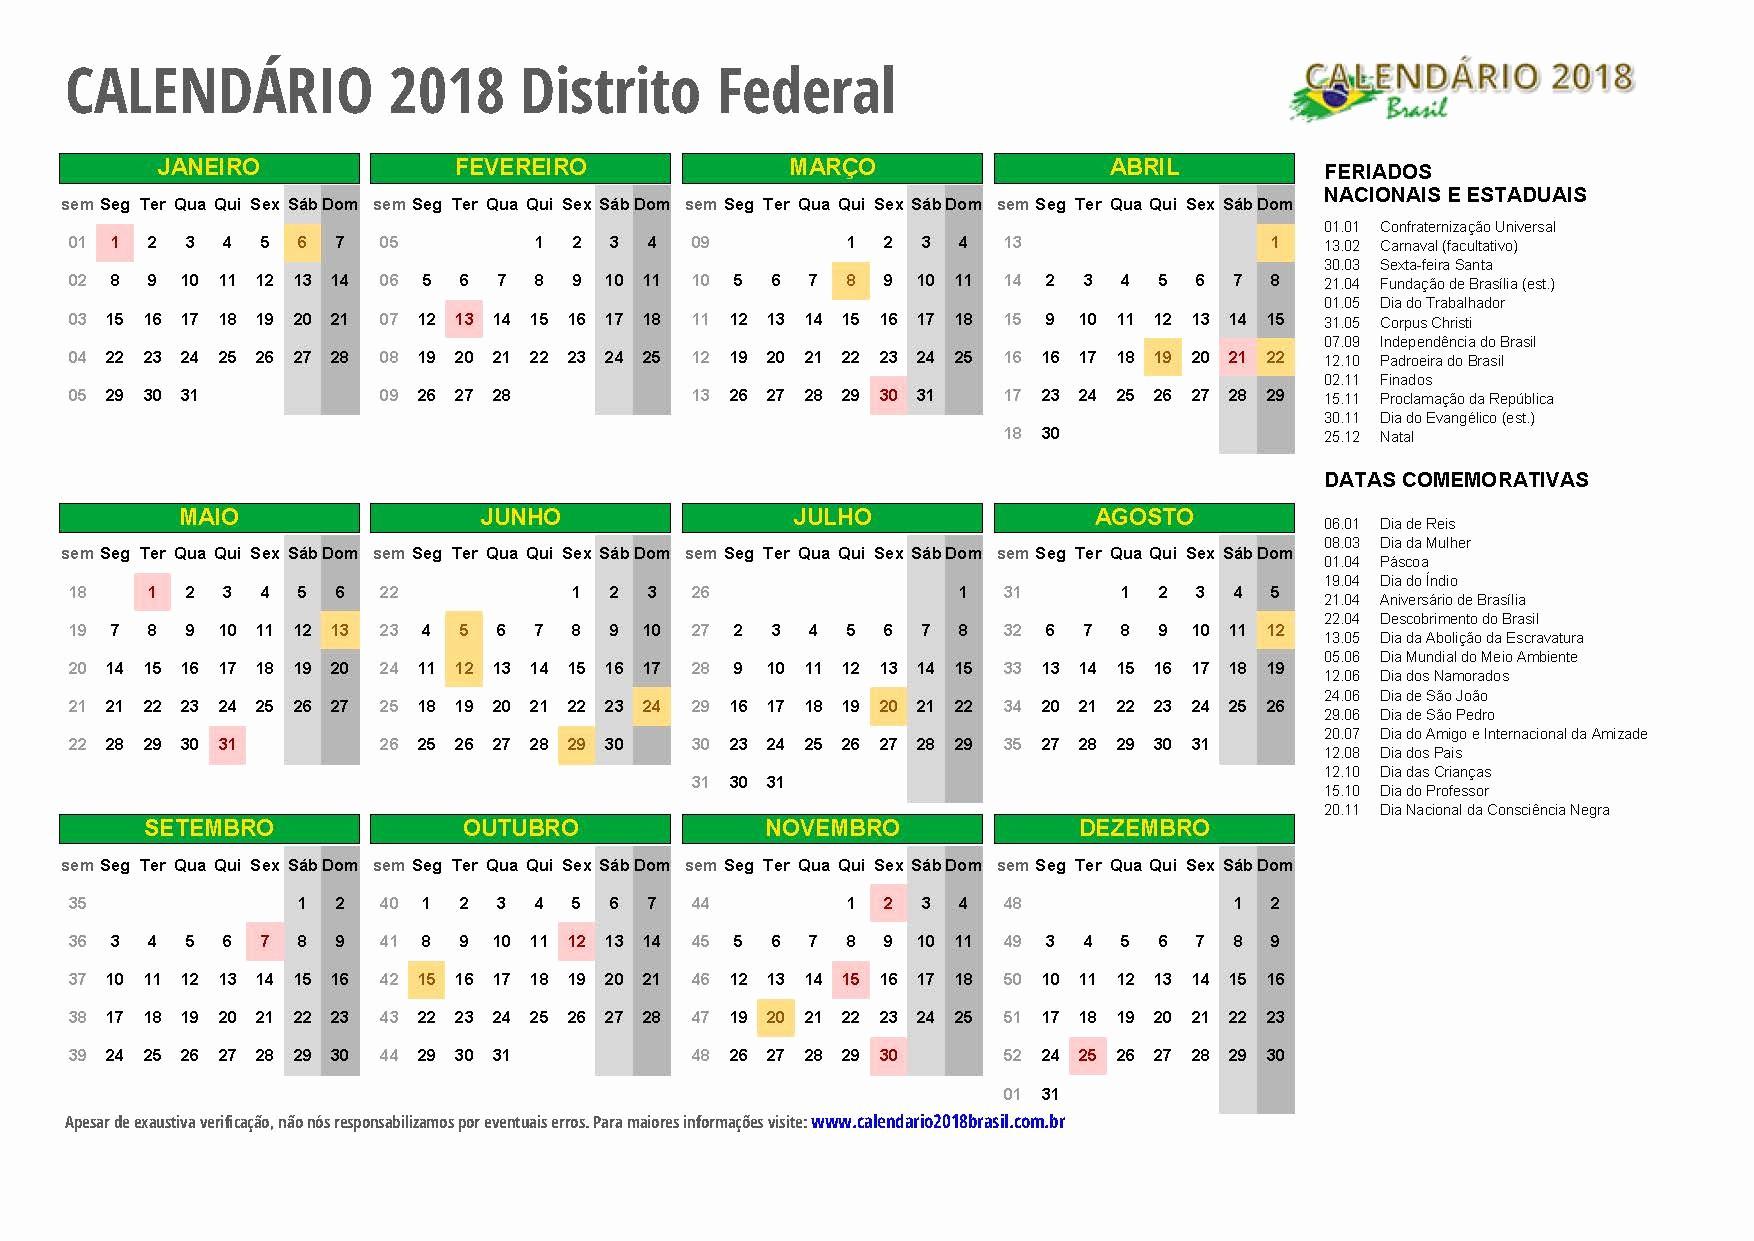 Calendario 2019 Brasil Carnaval Más Populares Mundial 2019 Calendario Excel Links Interessantes Calendario De Of Calendario 2019 Brasil Carnaval Mejores Y Más Novedosos Arte Para Calendario